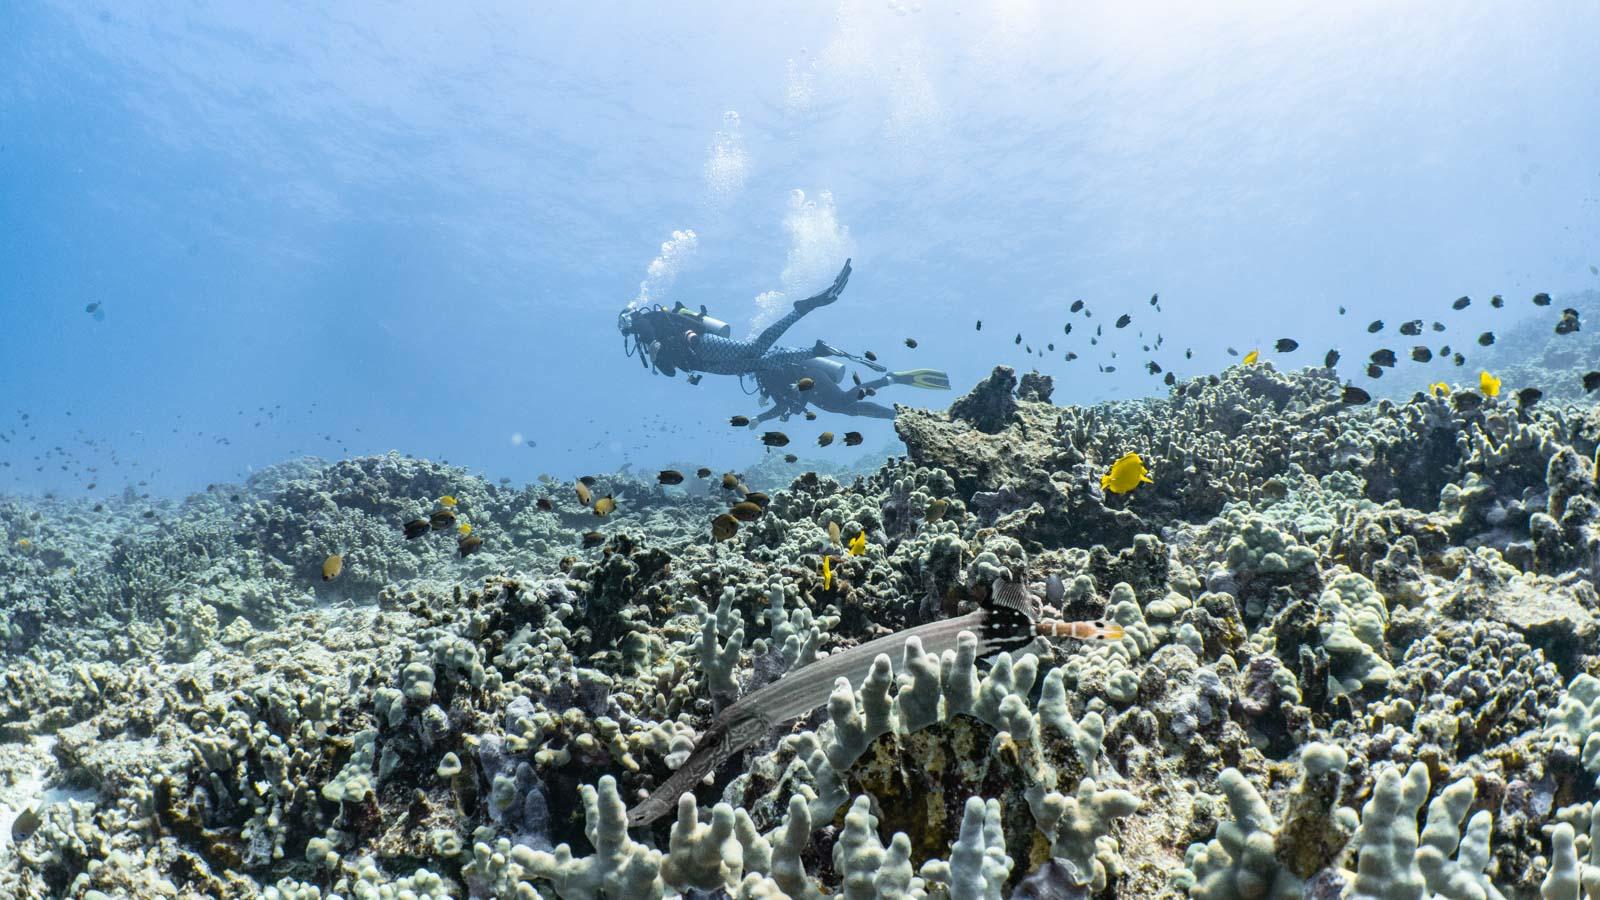 Scuba-Diving-Hawaii-Kona-Honu-Divers-14